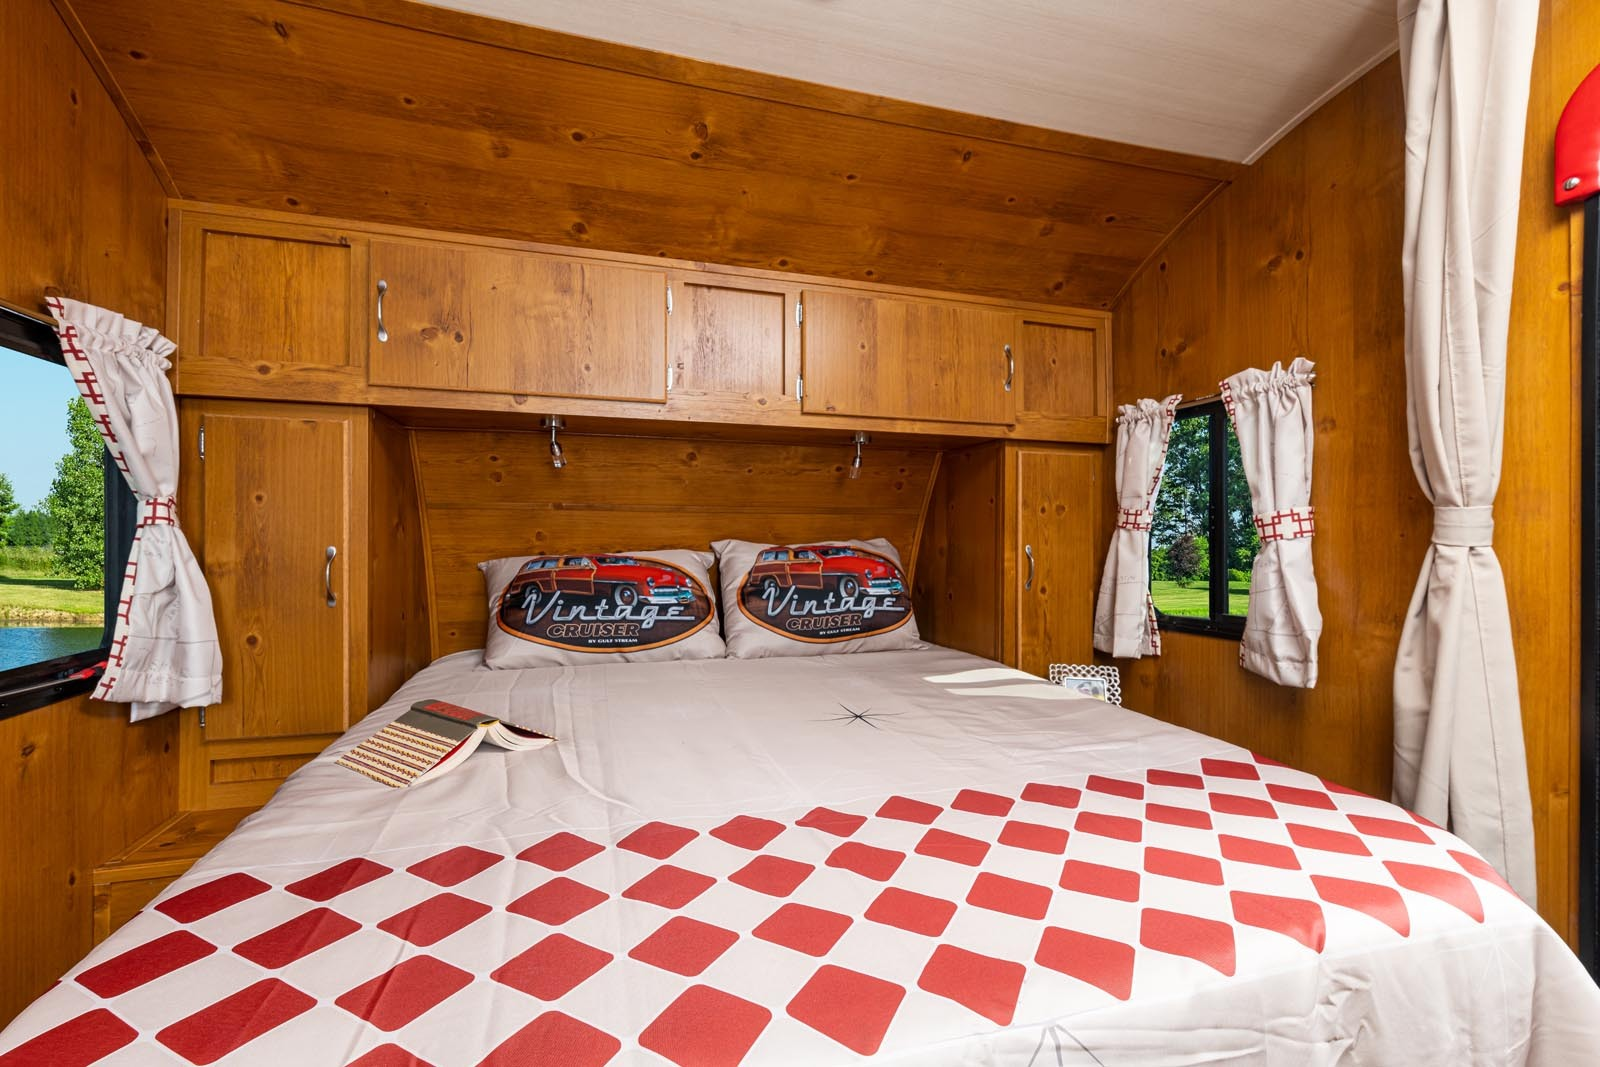 21 vn 19rbs crim bed